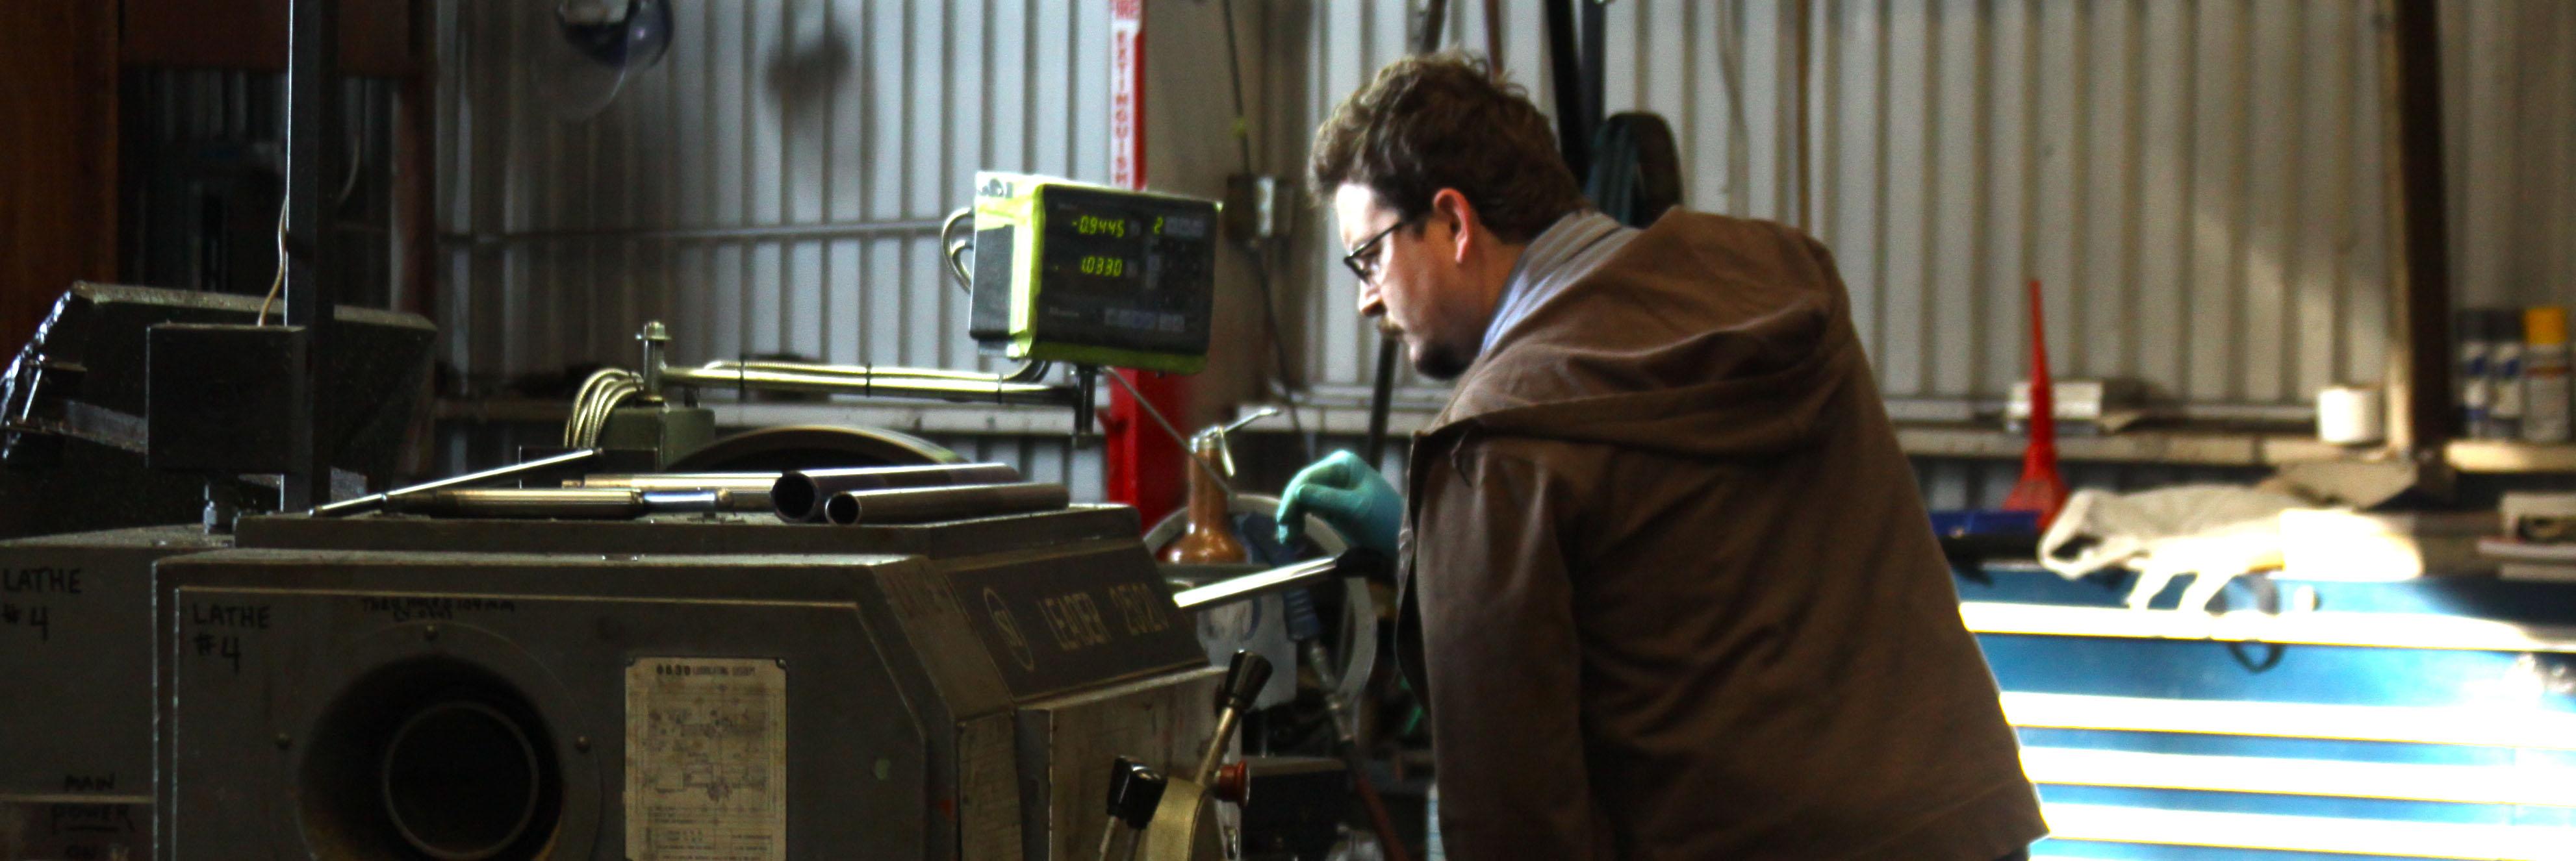 hydraulics worker